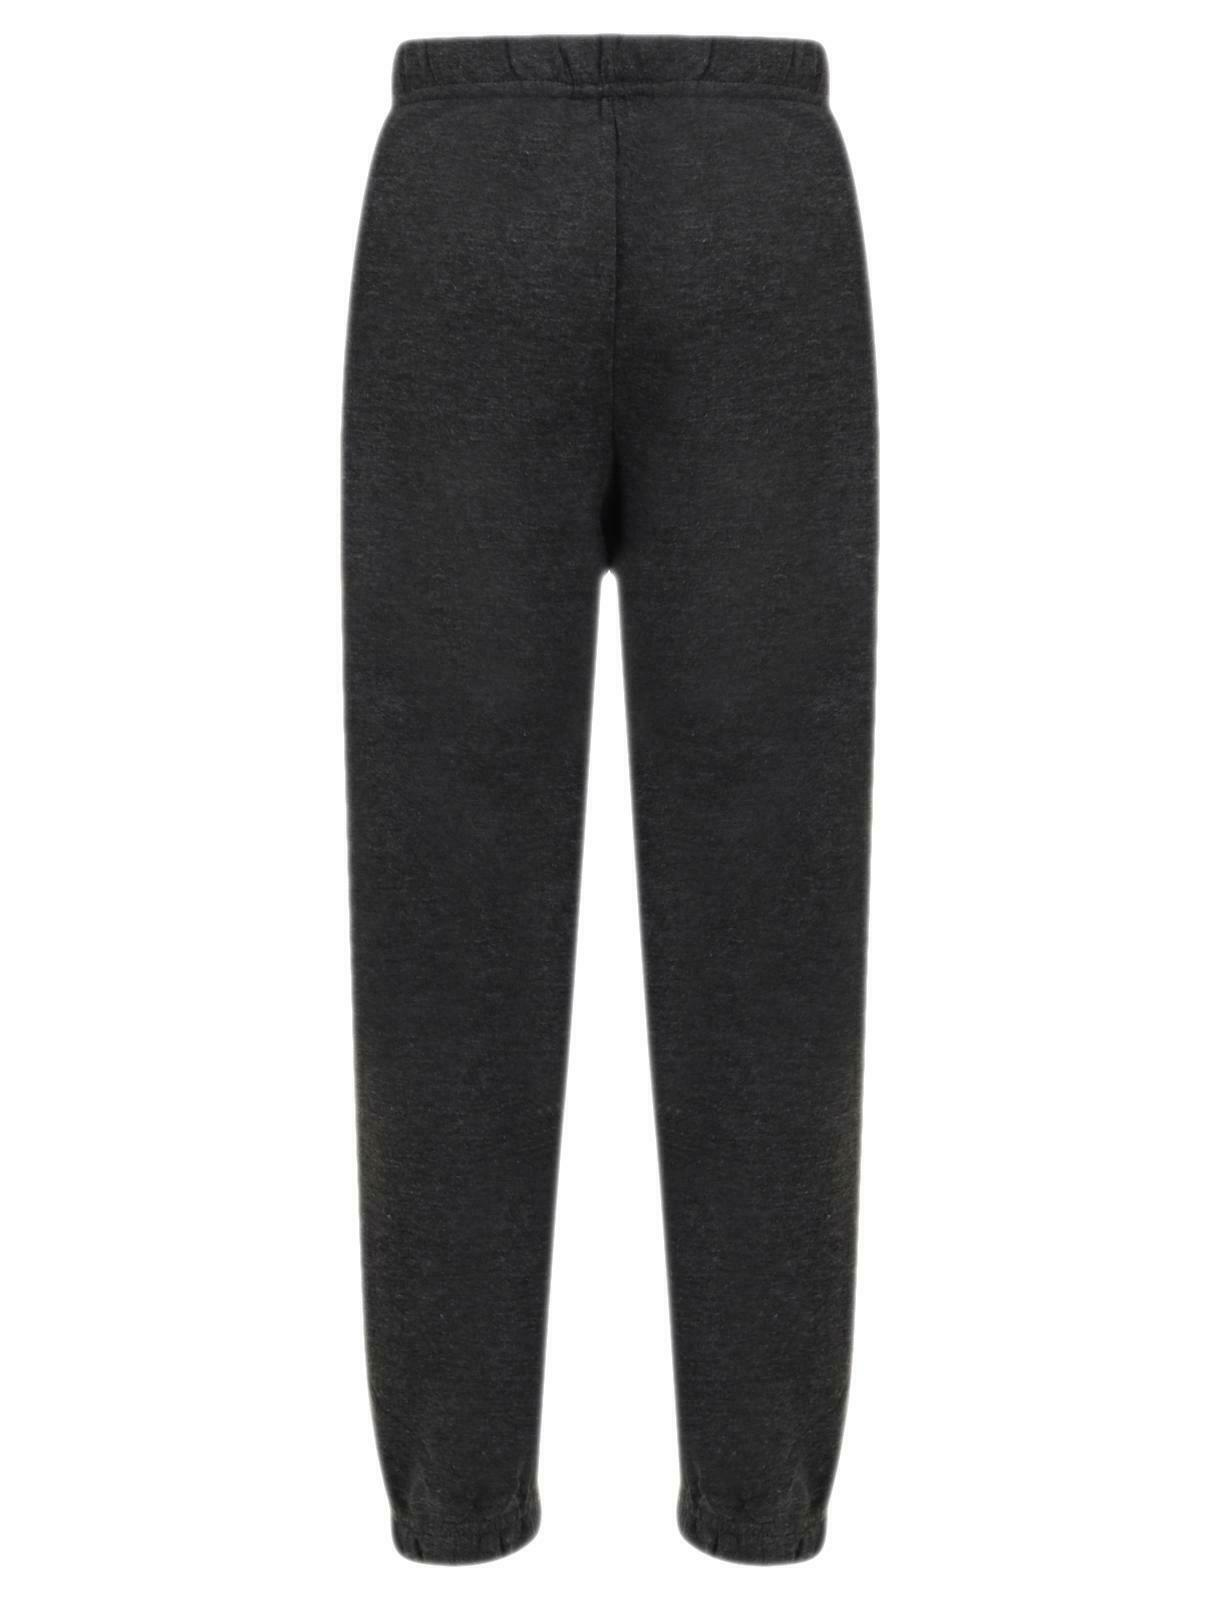 Kids Fleece Trouser Charcoal (Pack of 12)